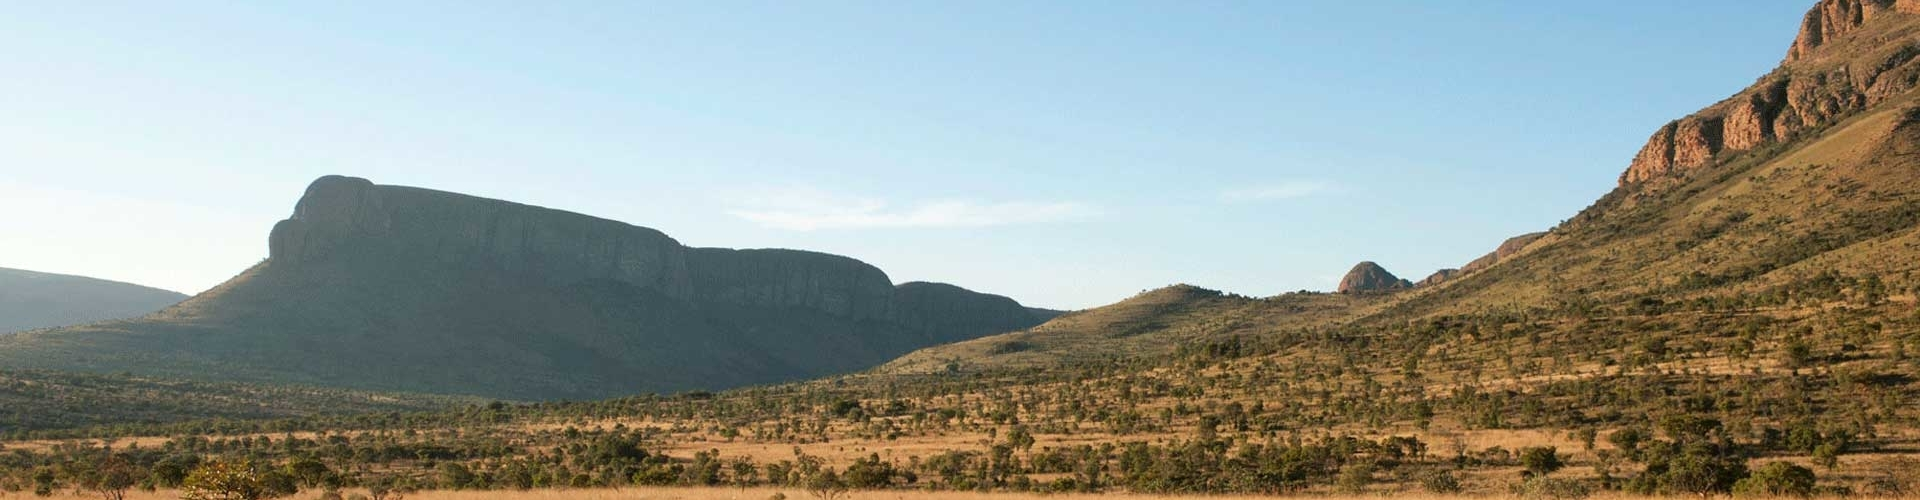 Marakele National Park - Luxe Safari Zuid-Afrika - Header